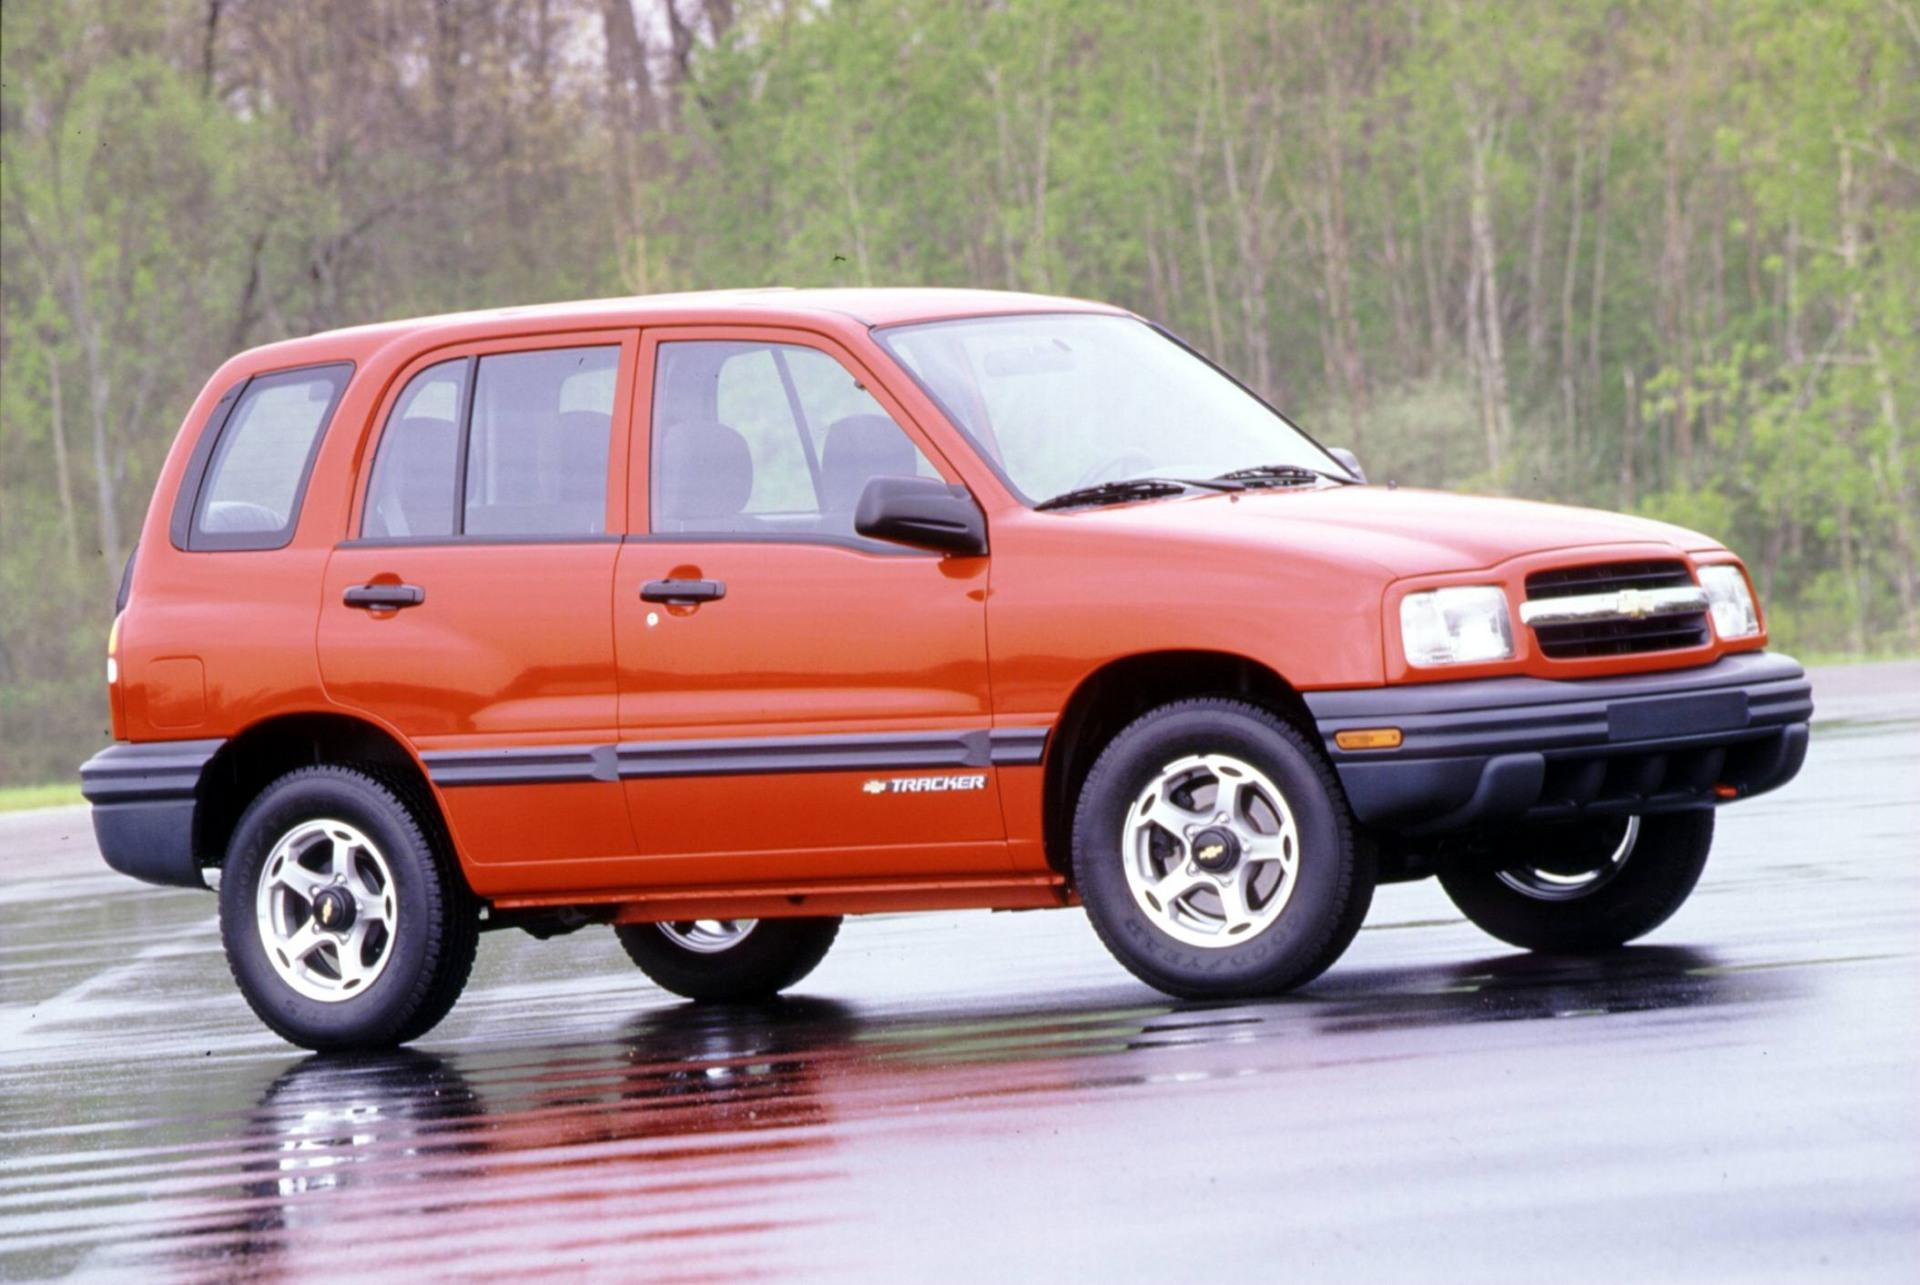 2000 Chevrolet Tracker Image. Photo 14 of 21